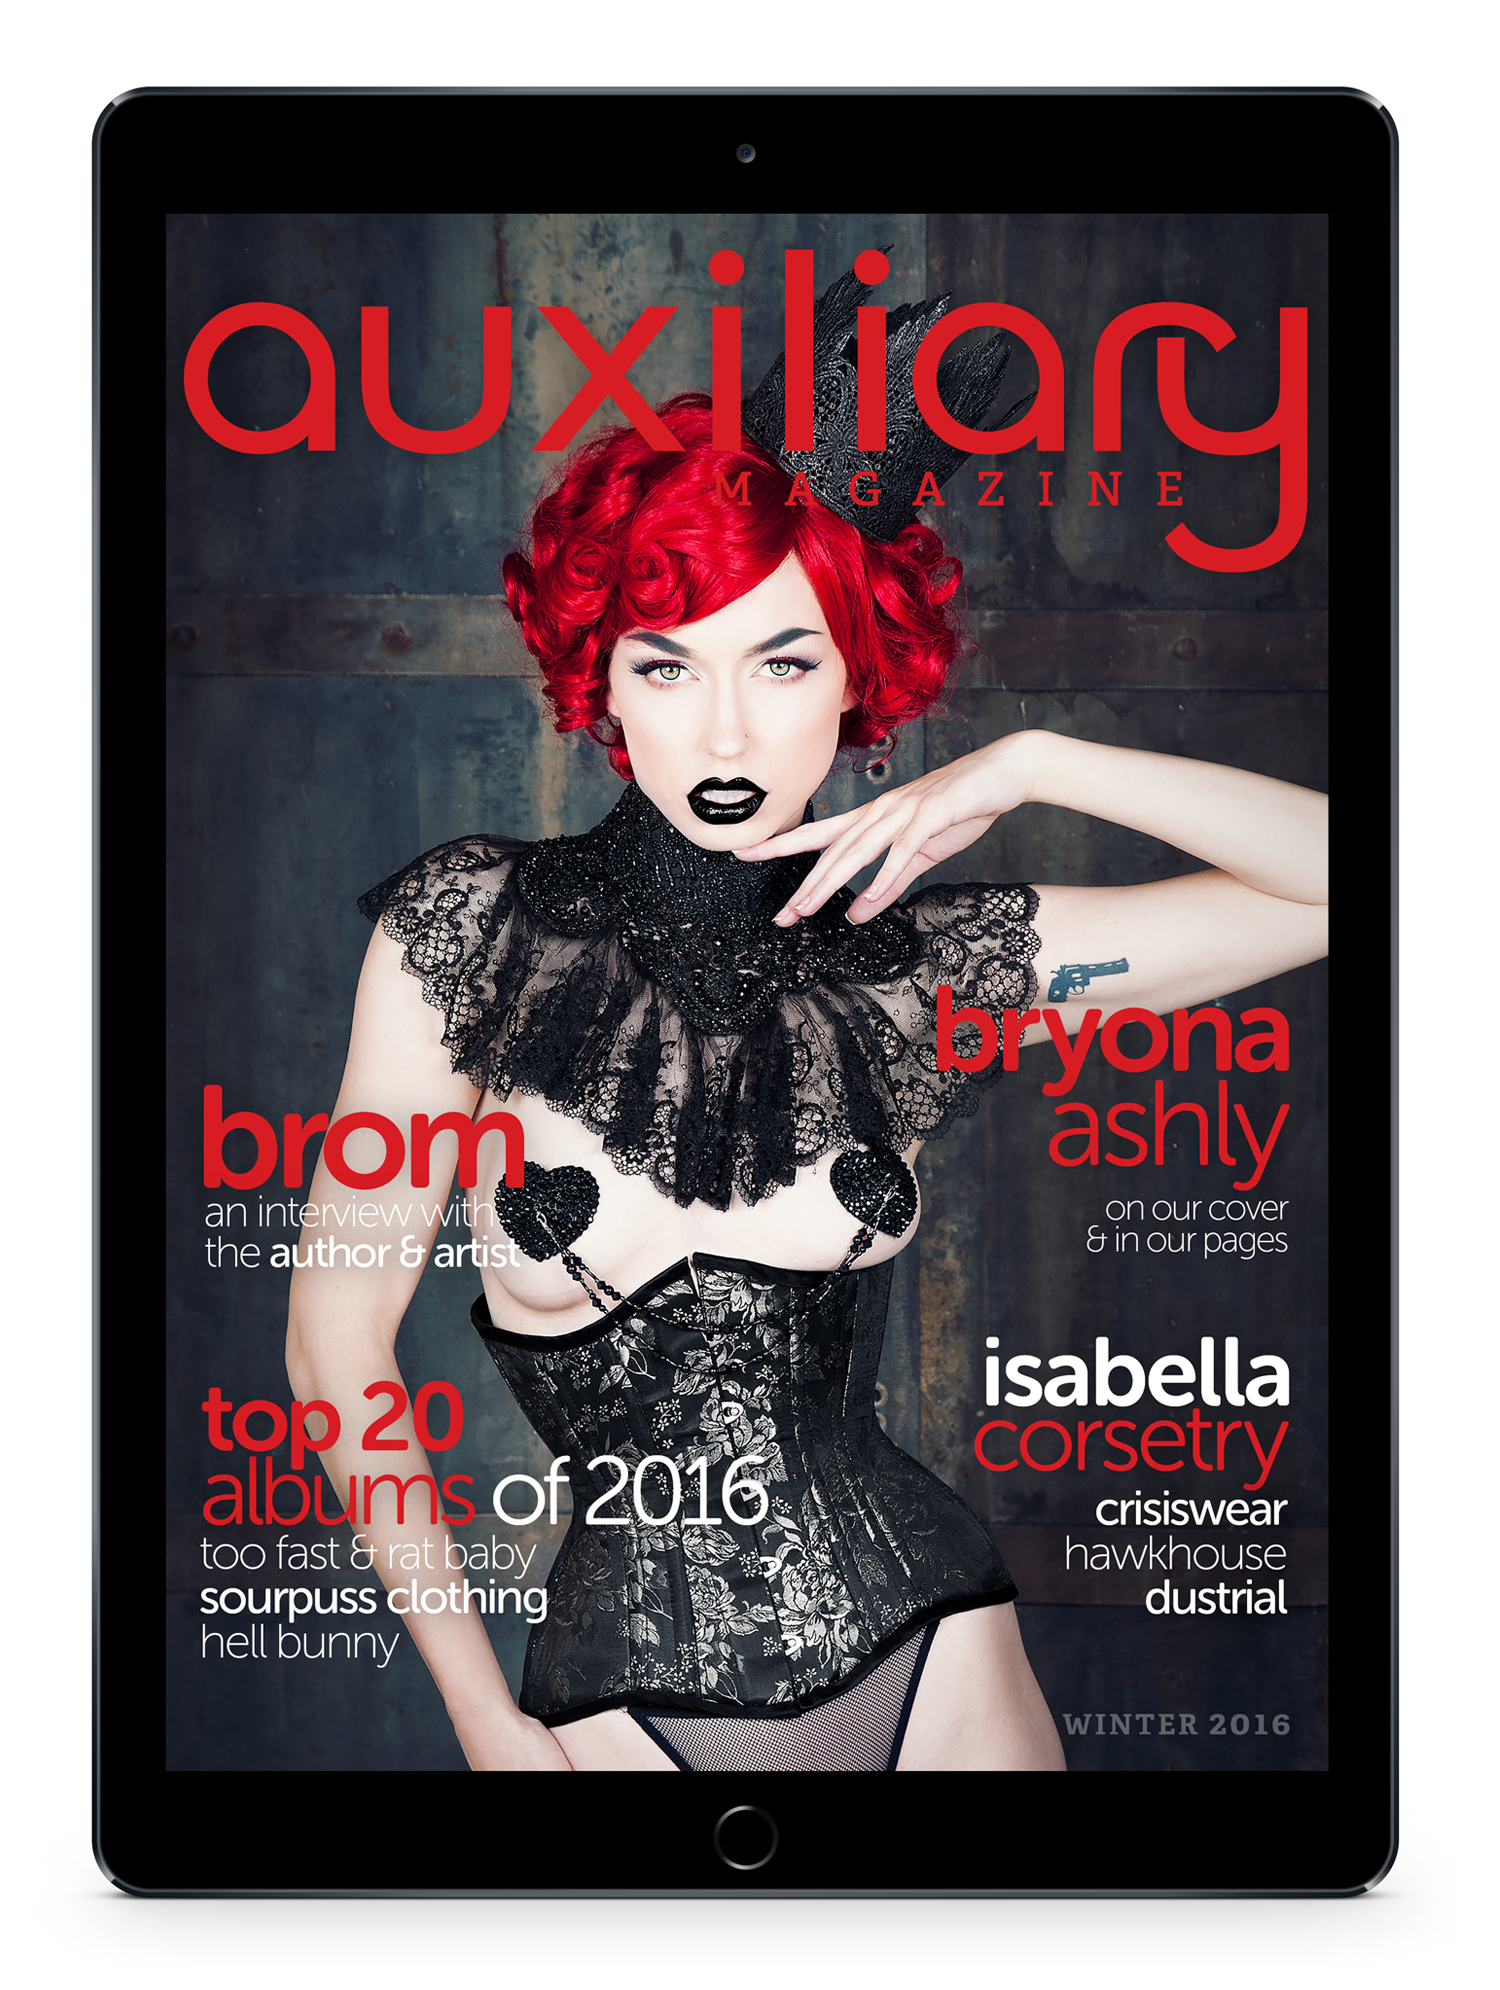 Auxiliary Magazine Winter 2016 Digital Issue